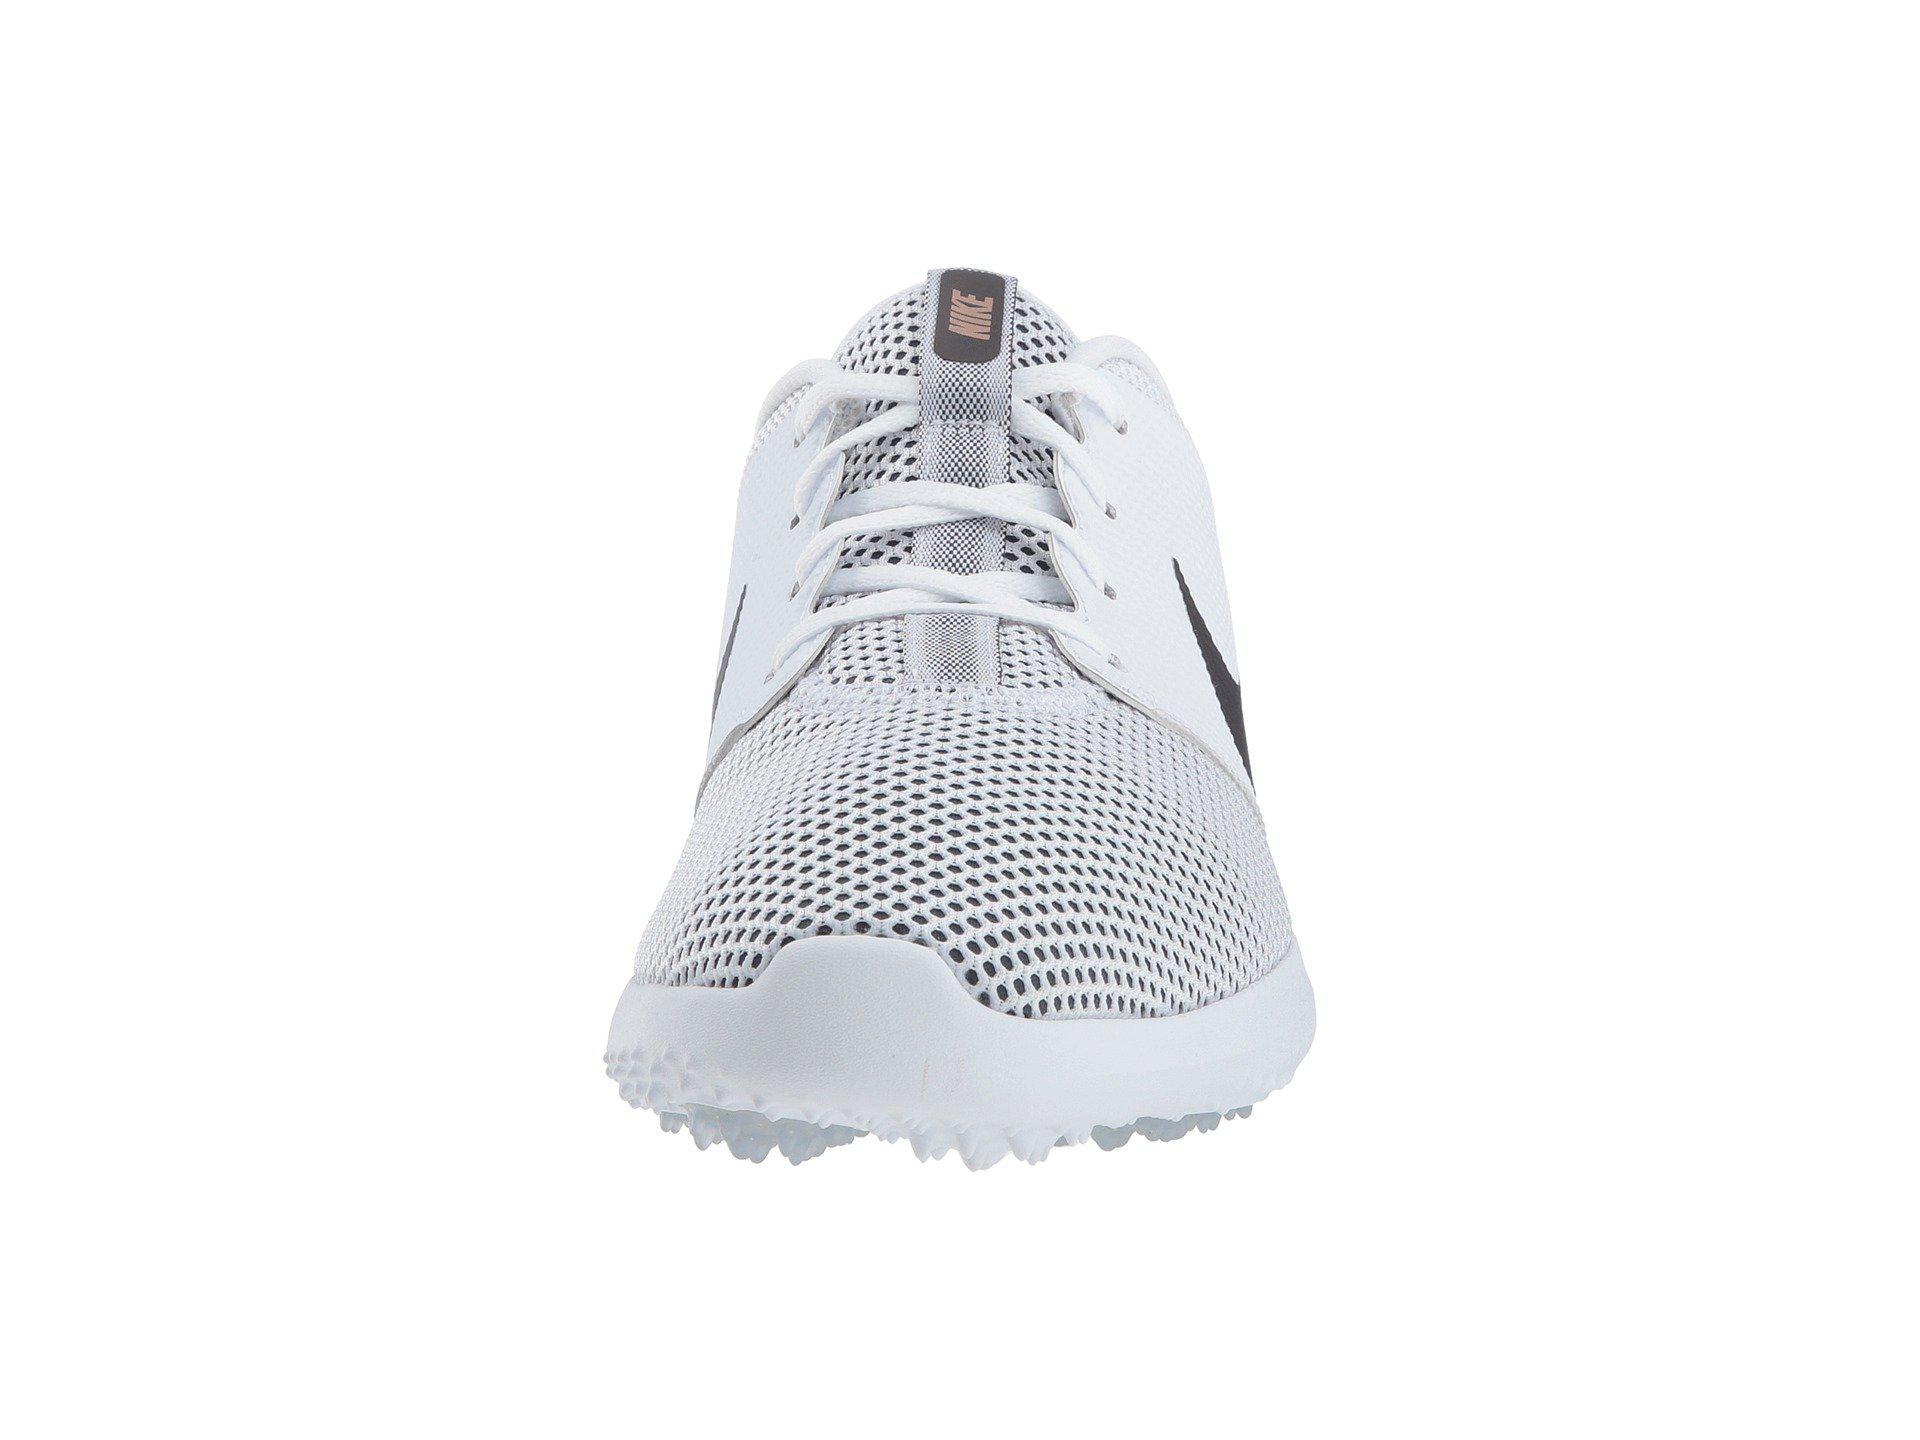 3e008e9cbb98 Nike Roshe G Golf Shoes White Gold  Nike womens lunar duet golf ...